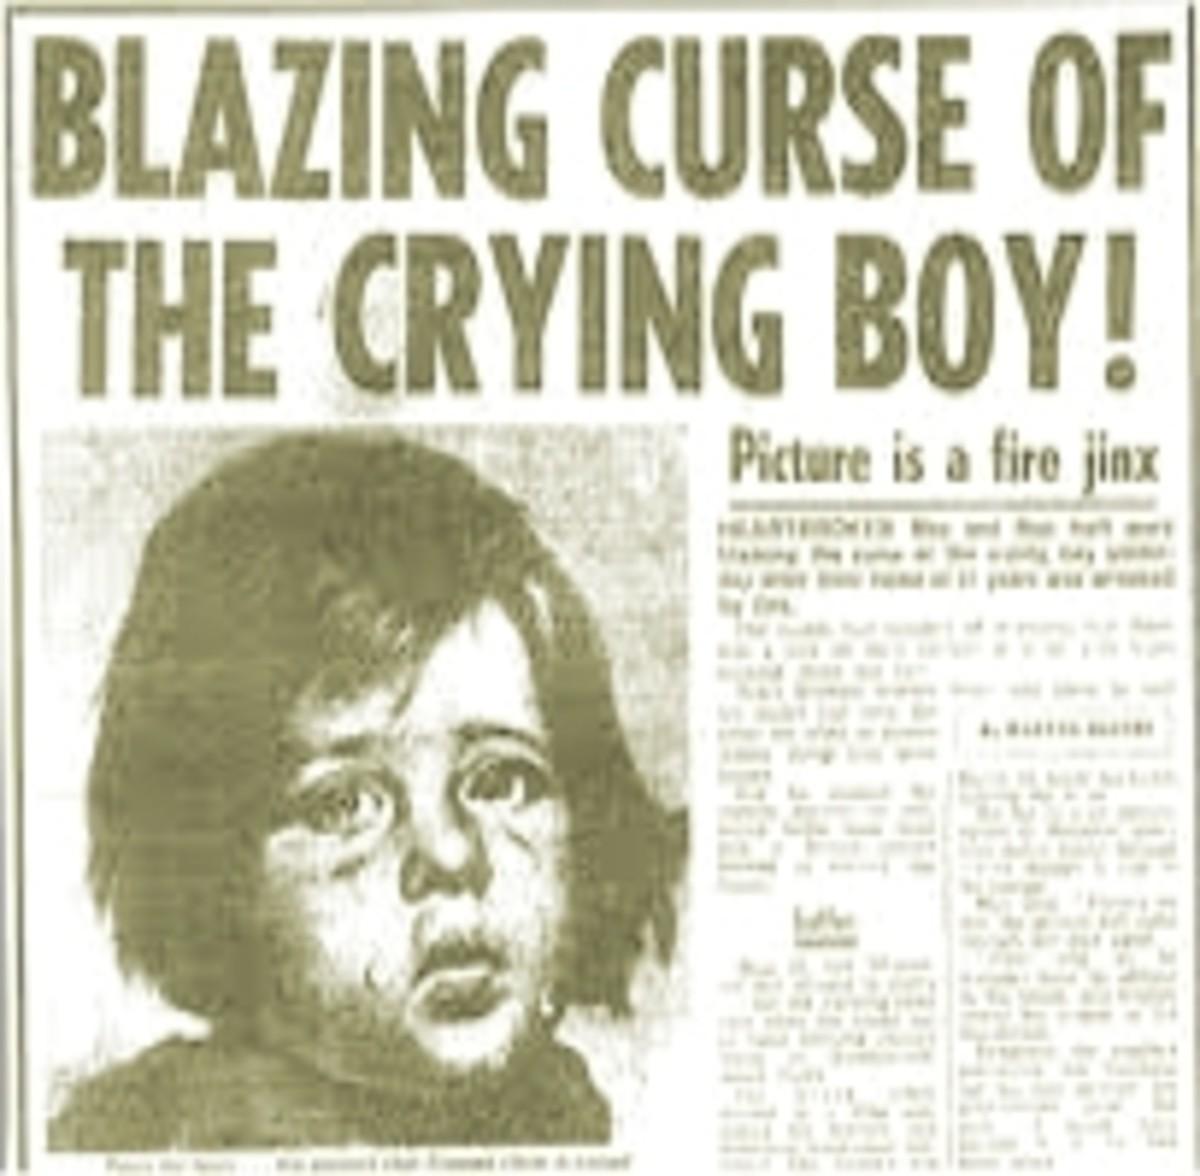 The Sun Headline